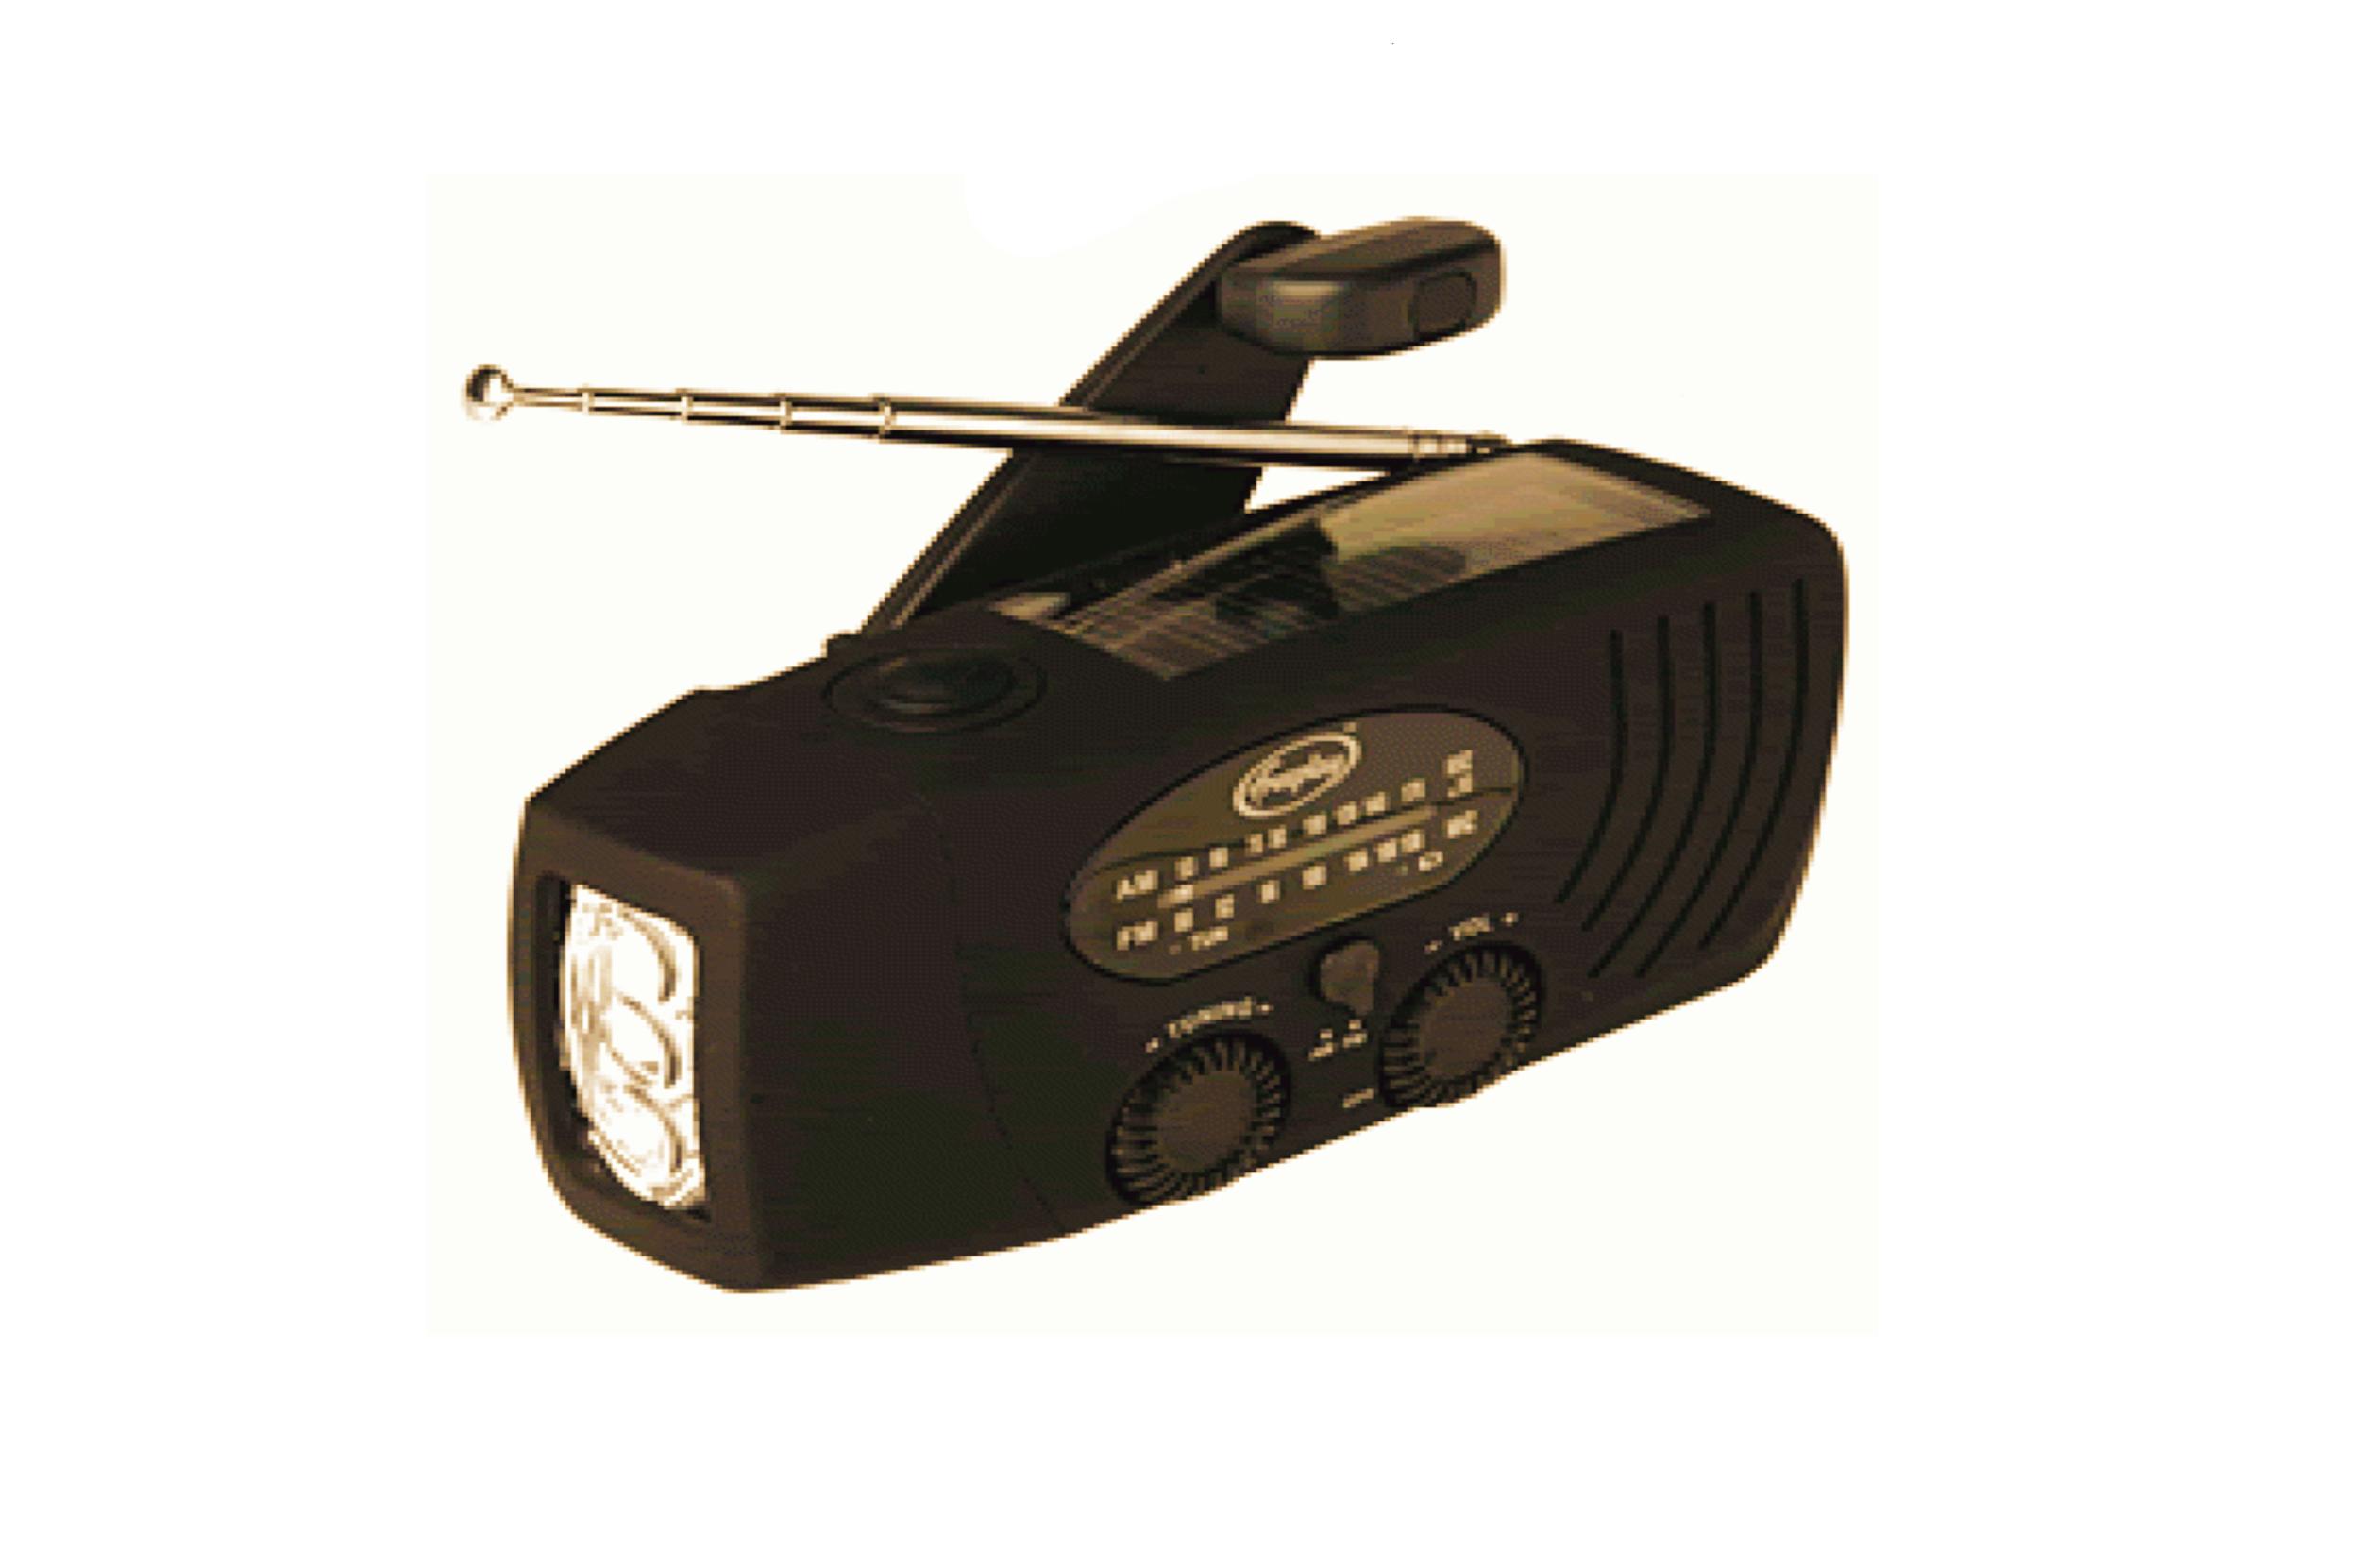 COMPANION RADIO FLASHLIGHT